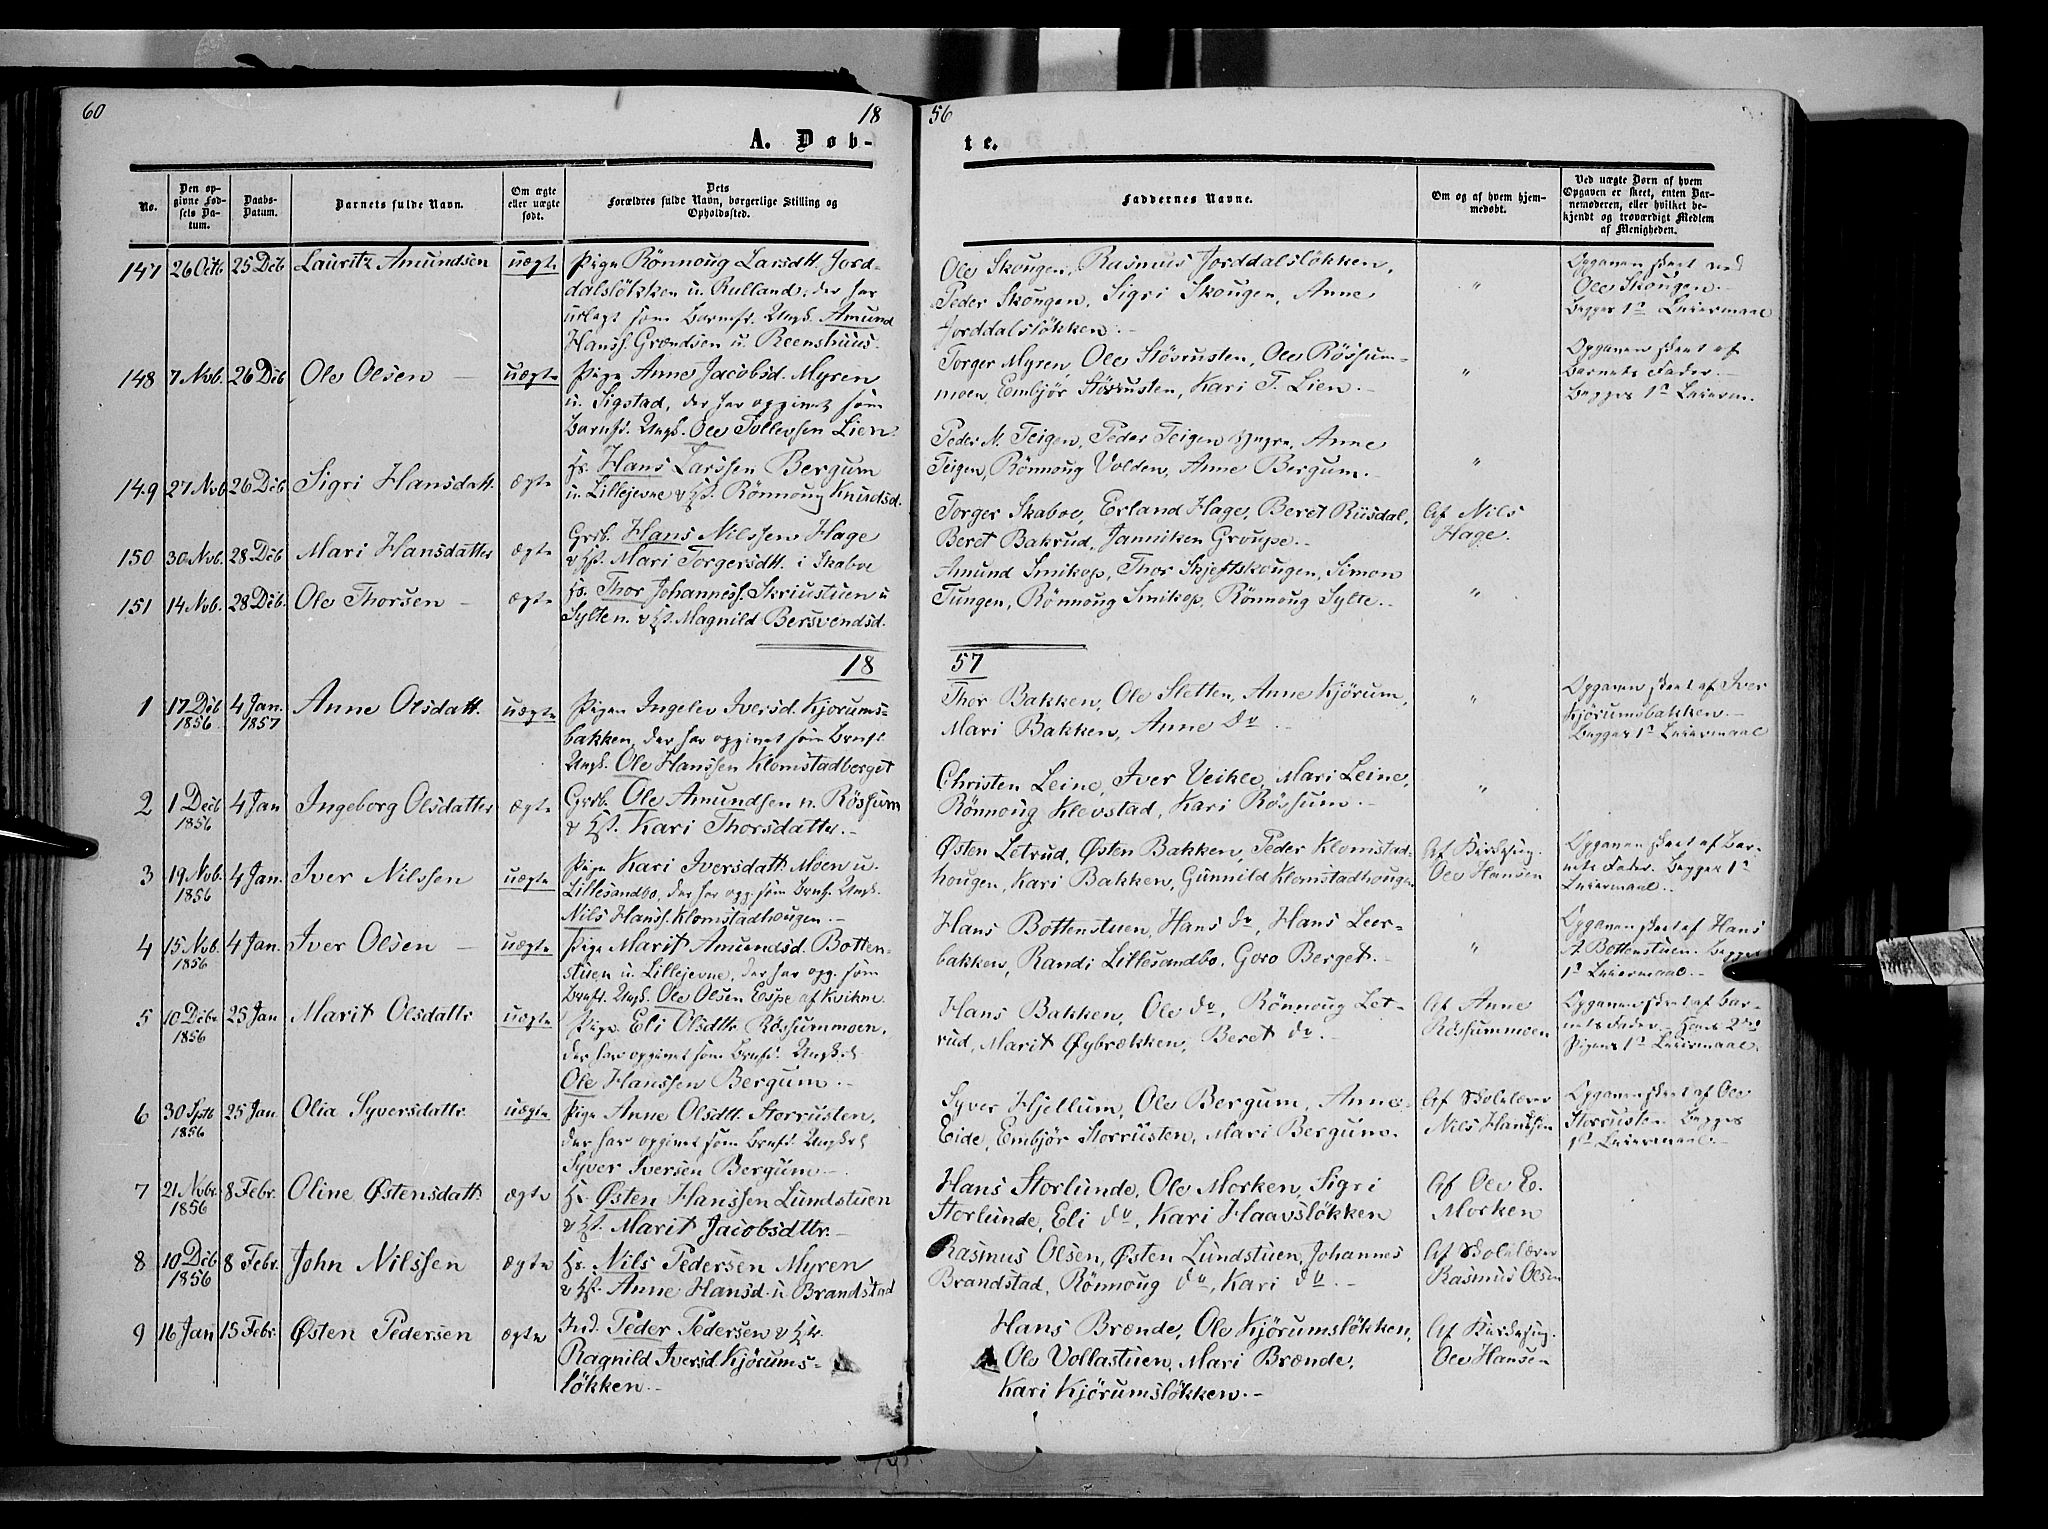 SAH, Nord-Fron prestekontor, Ministerialbok nr. 1, 1851-1864, s. 60